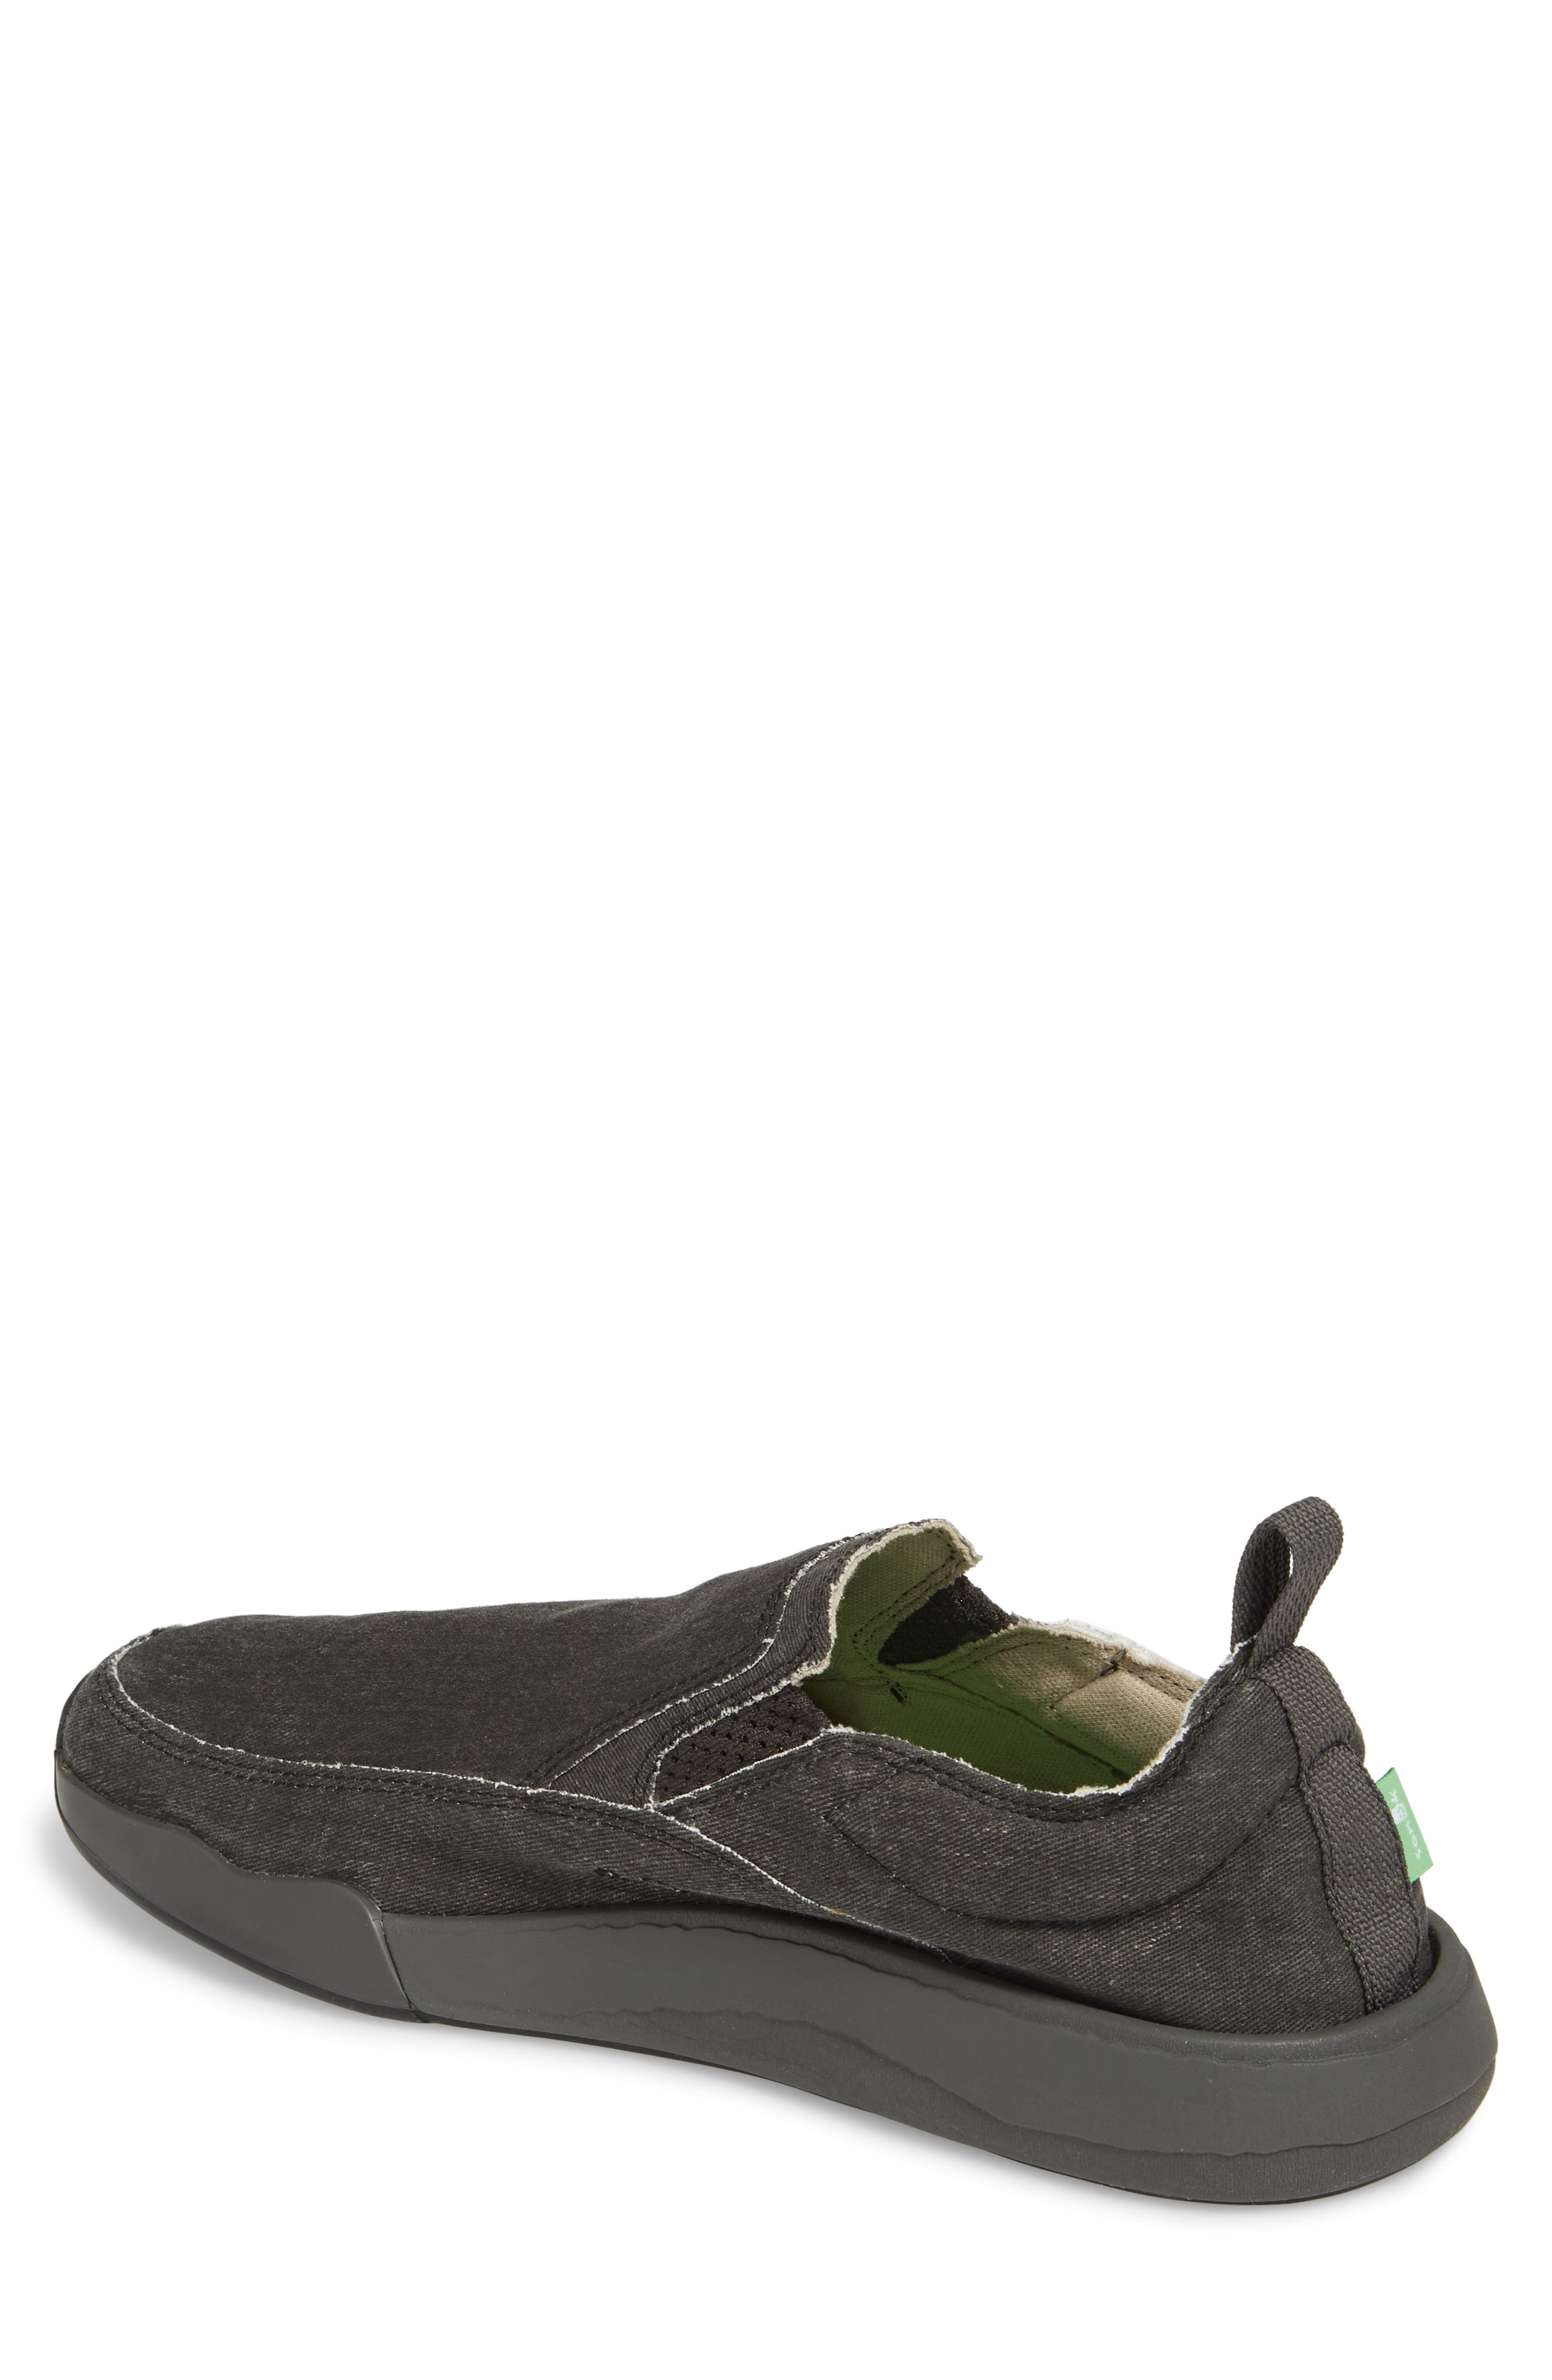 Chiba Quest Slip-On Sneaker,                             Alternate thumbnail 2, color,                             Black/ Black